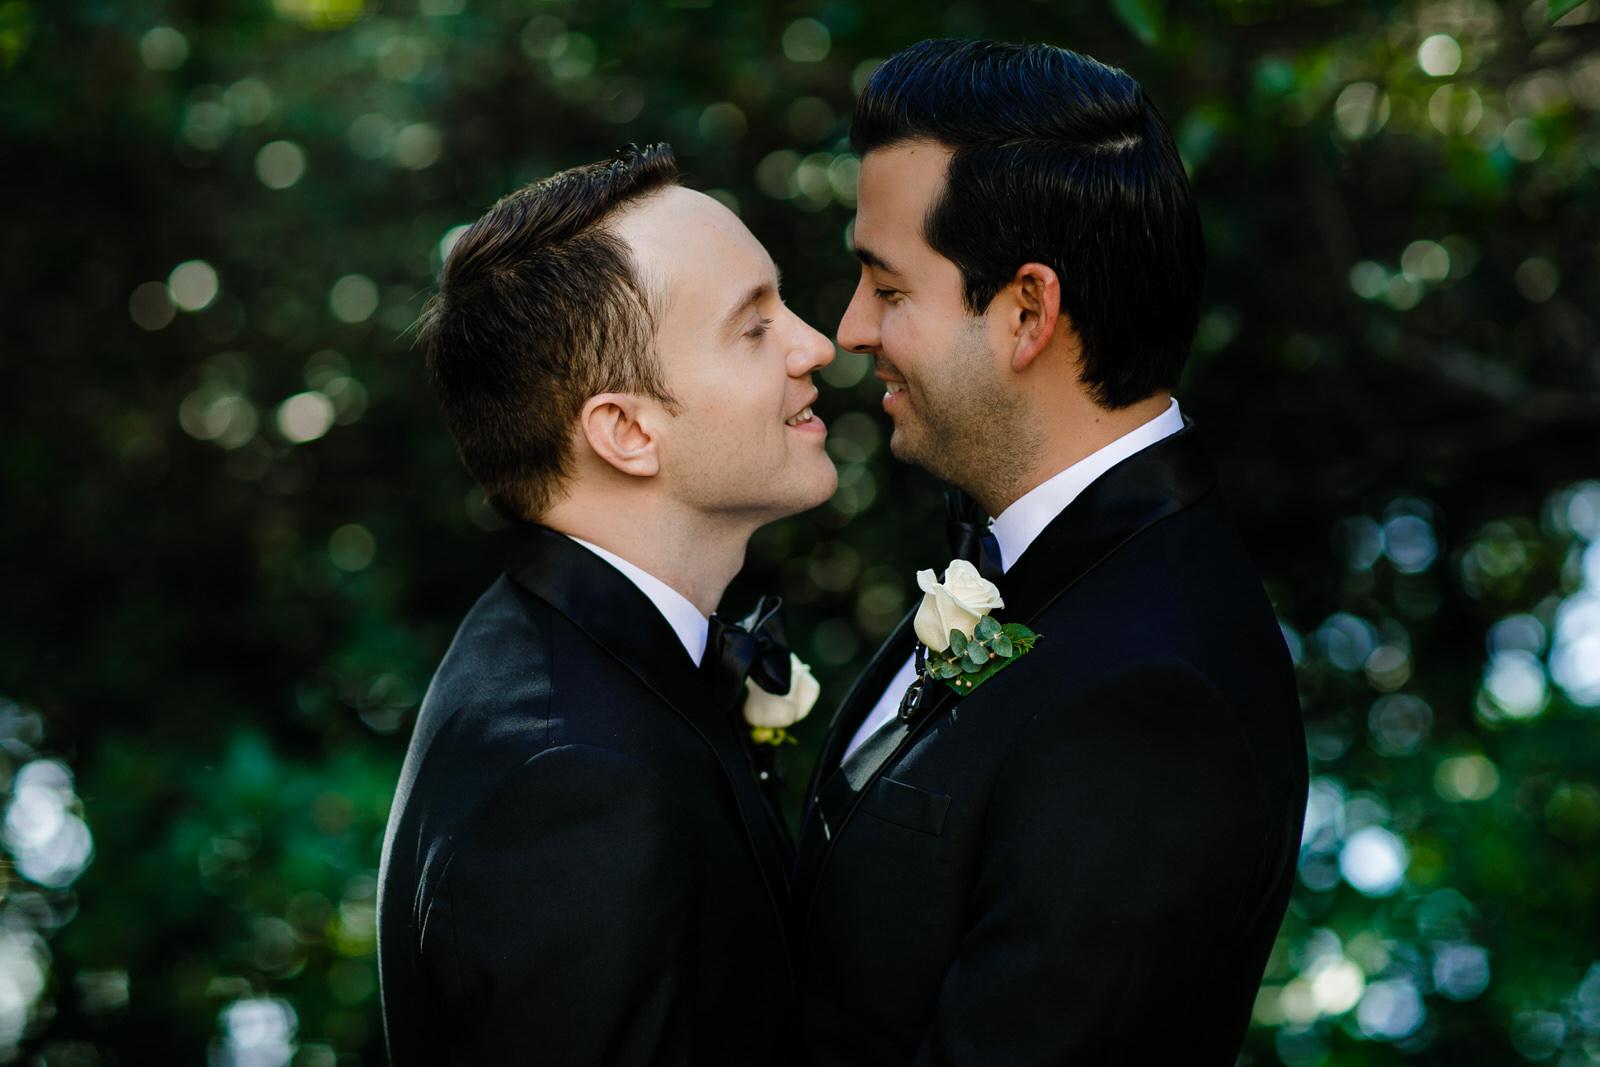 vizcaya_elopement_intimate_wedding_groom_portraits-13.jpg